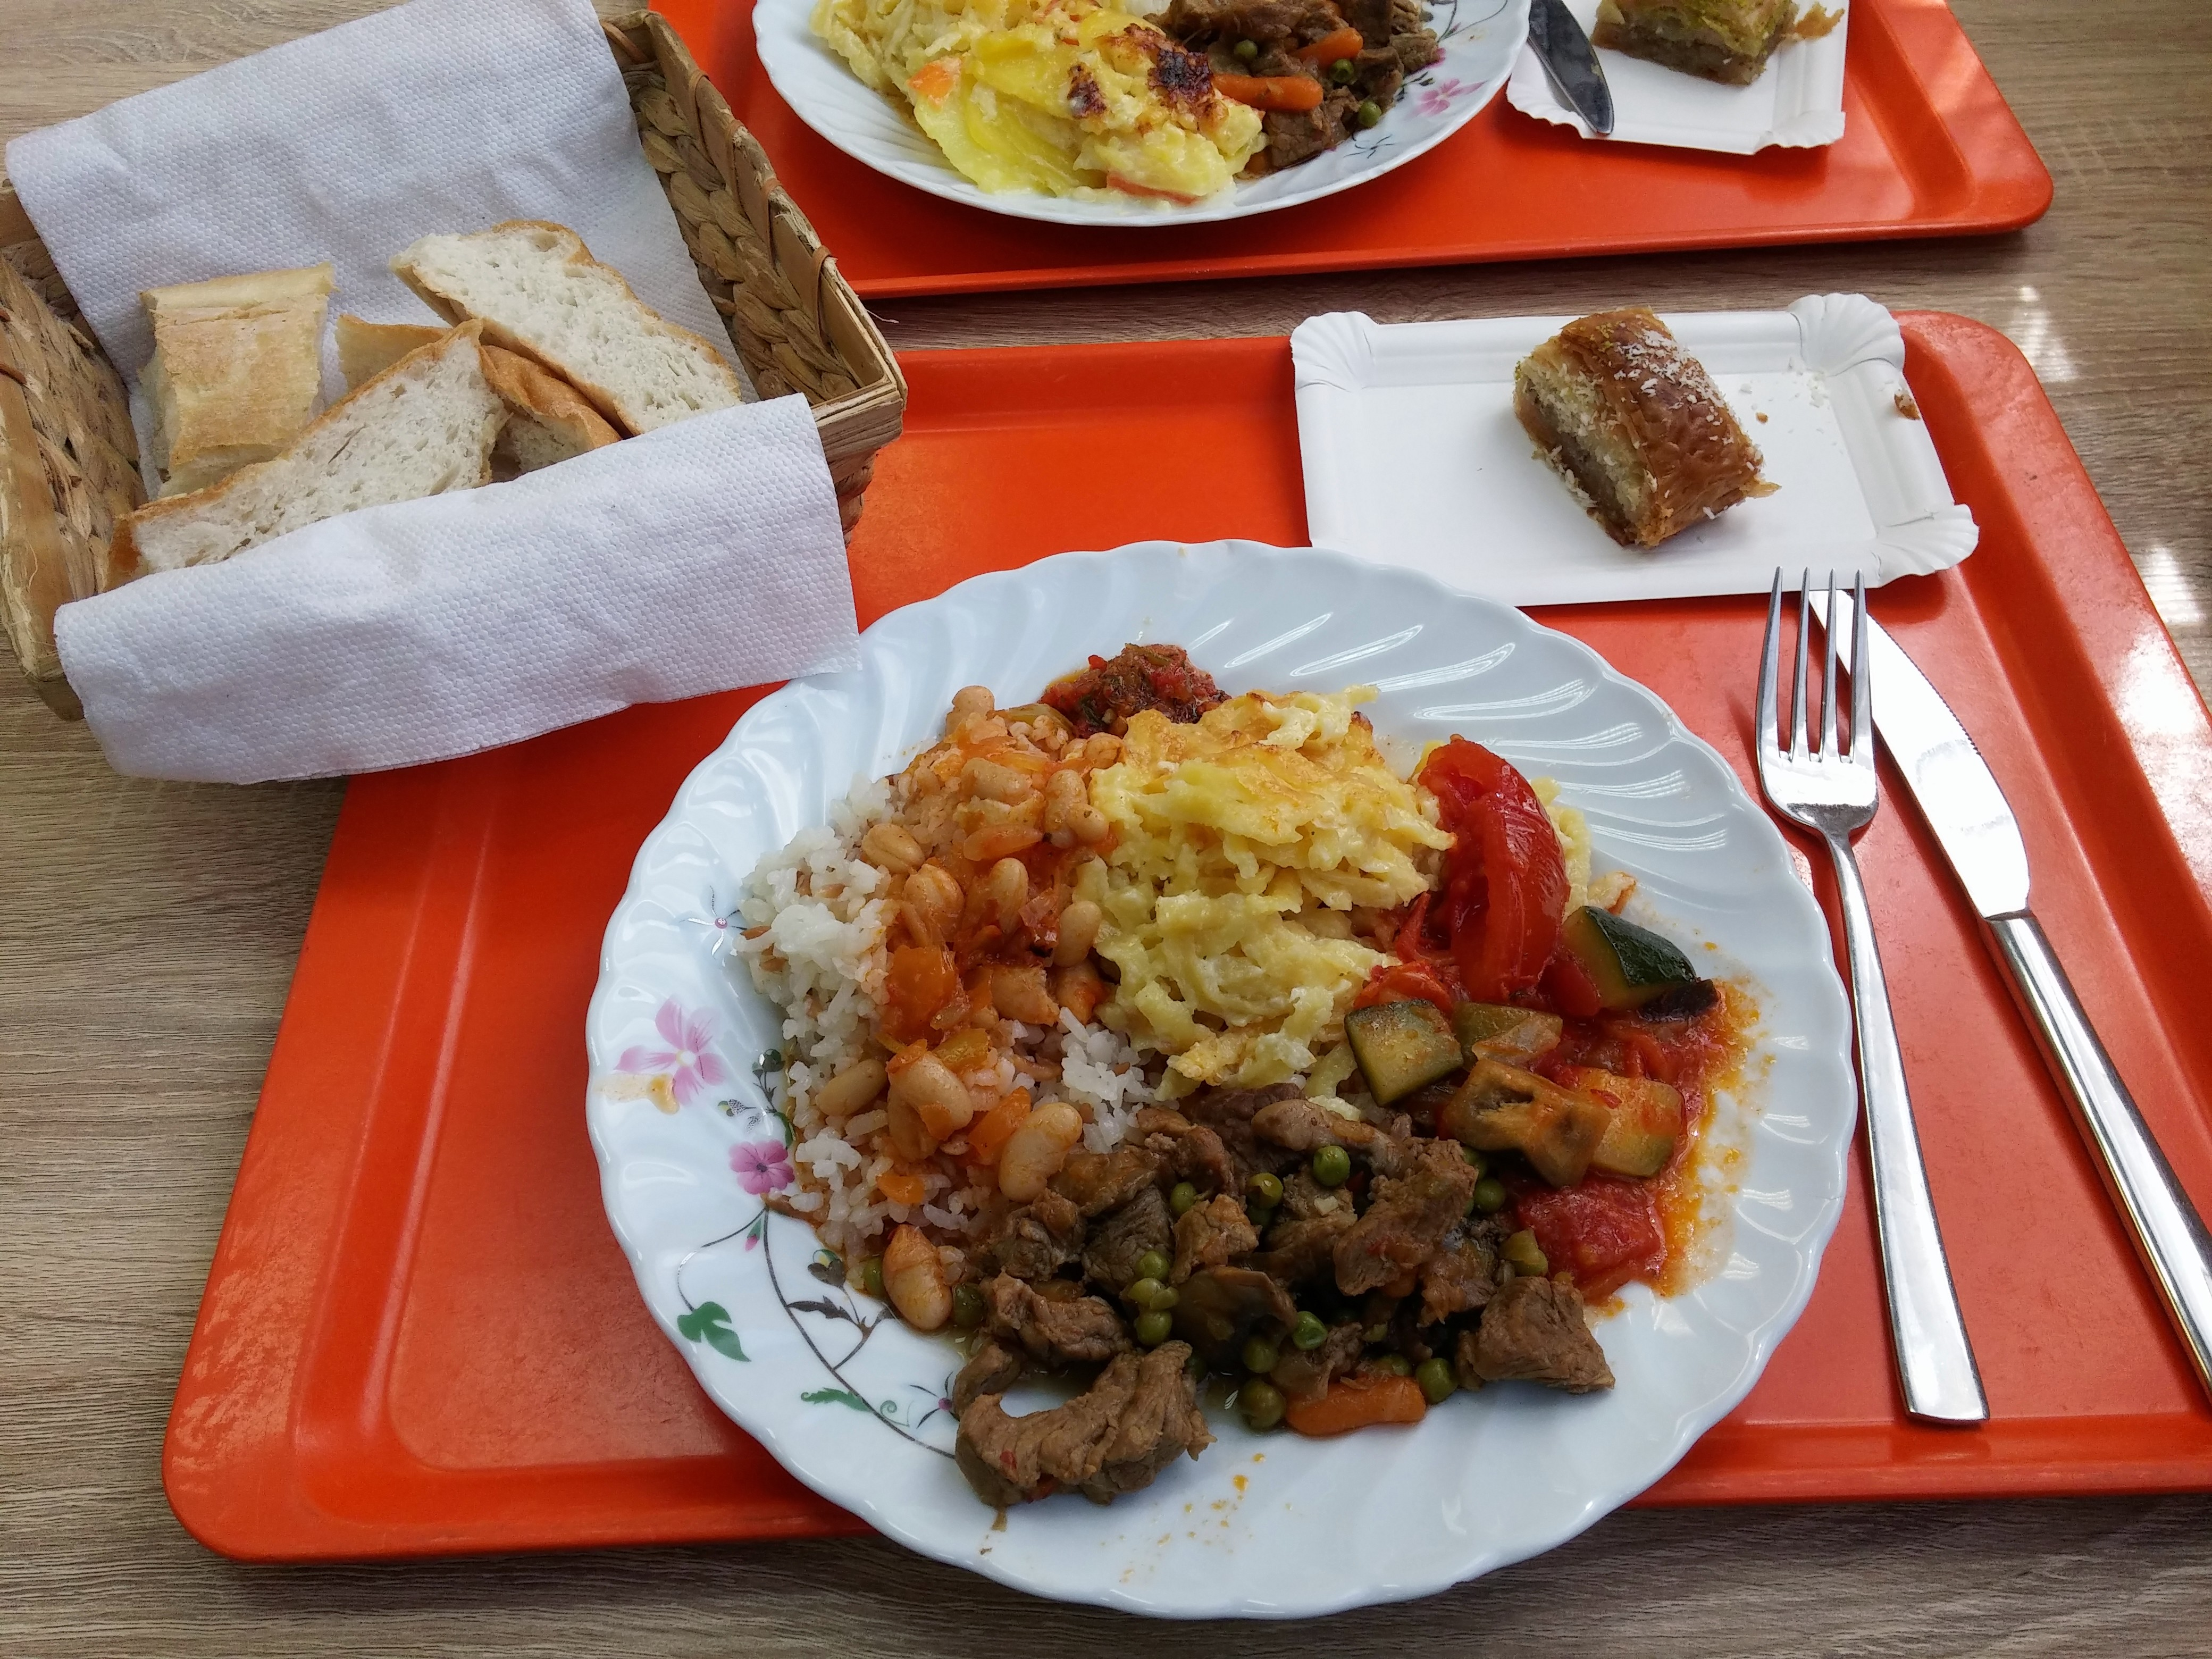 http://foodloader.net/nico_2015-04-20_reis-rindfleisch-kaesespaetzle-gemuese-brot-baklava.jpg